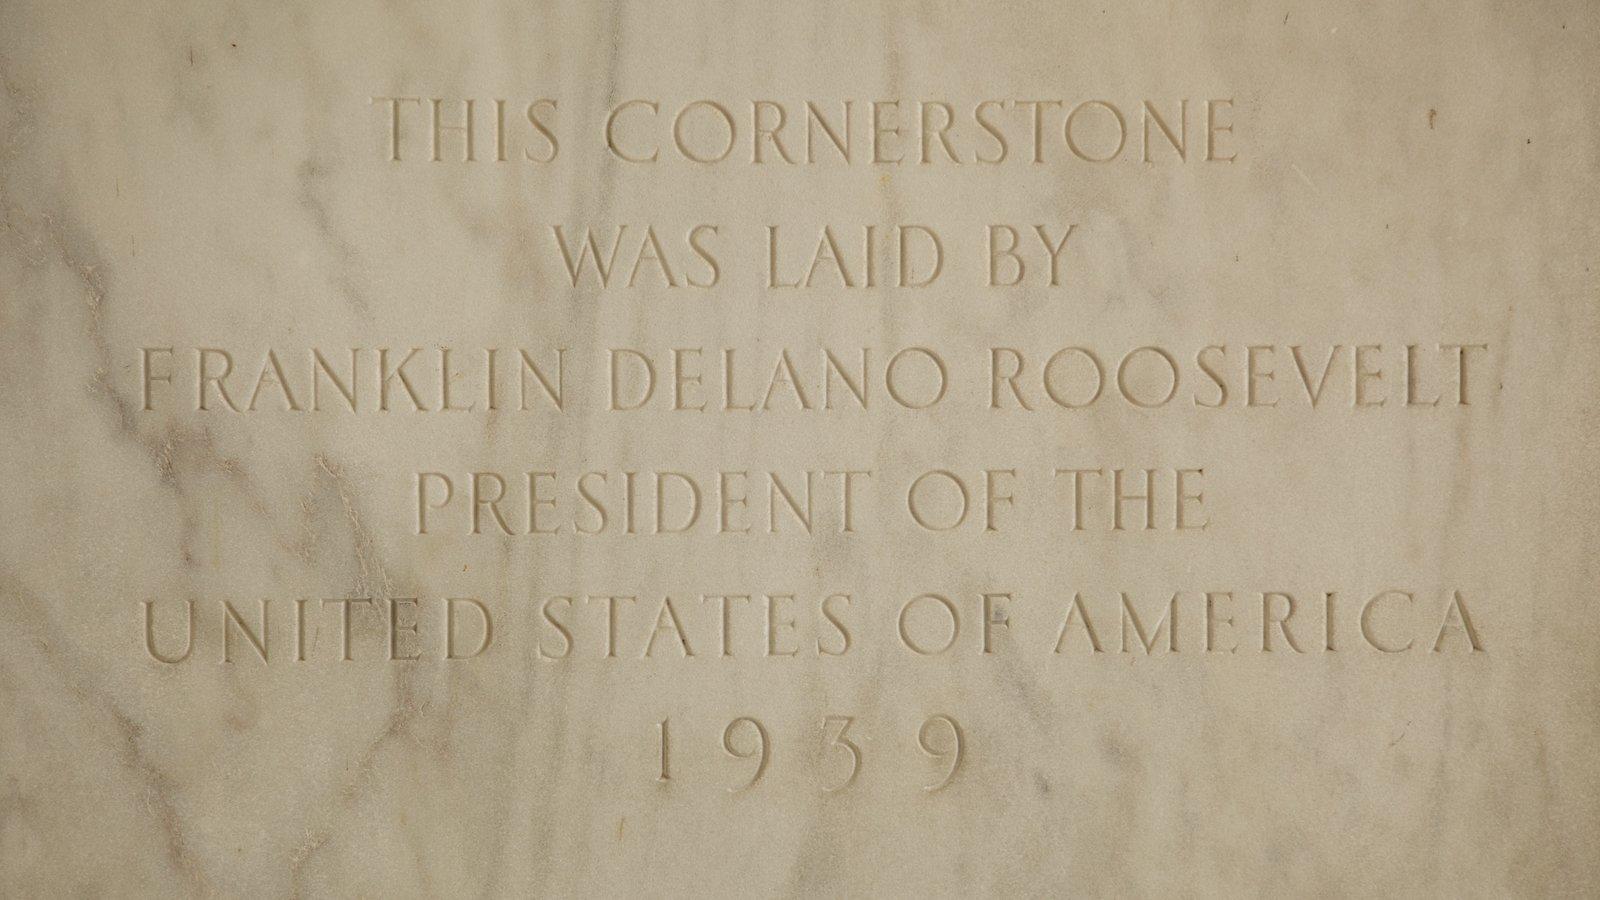 Jefferson Memorial showing a memorial